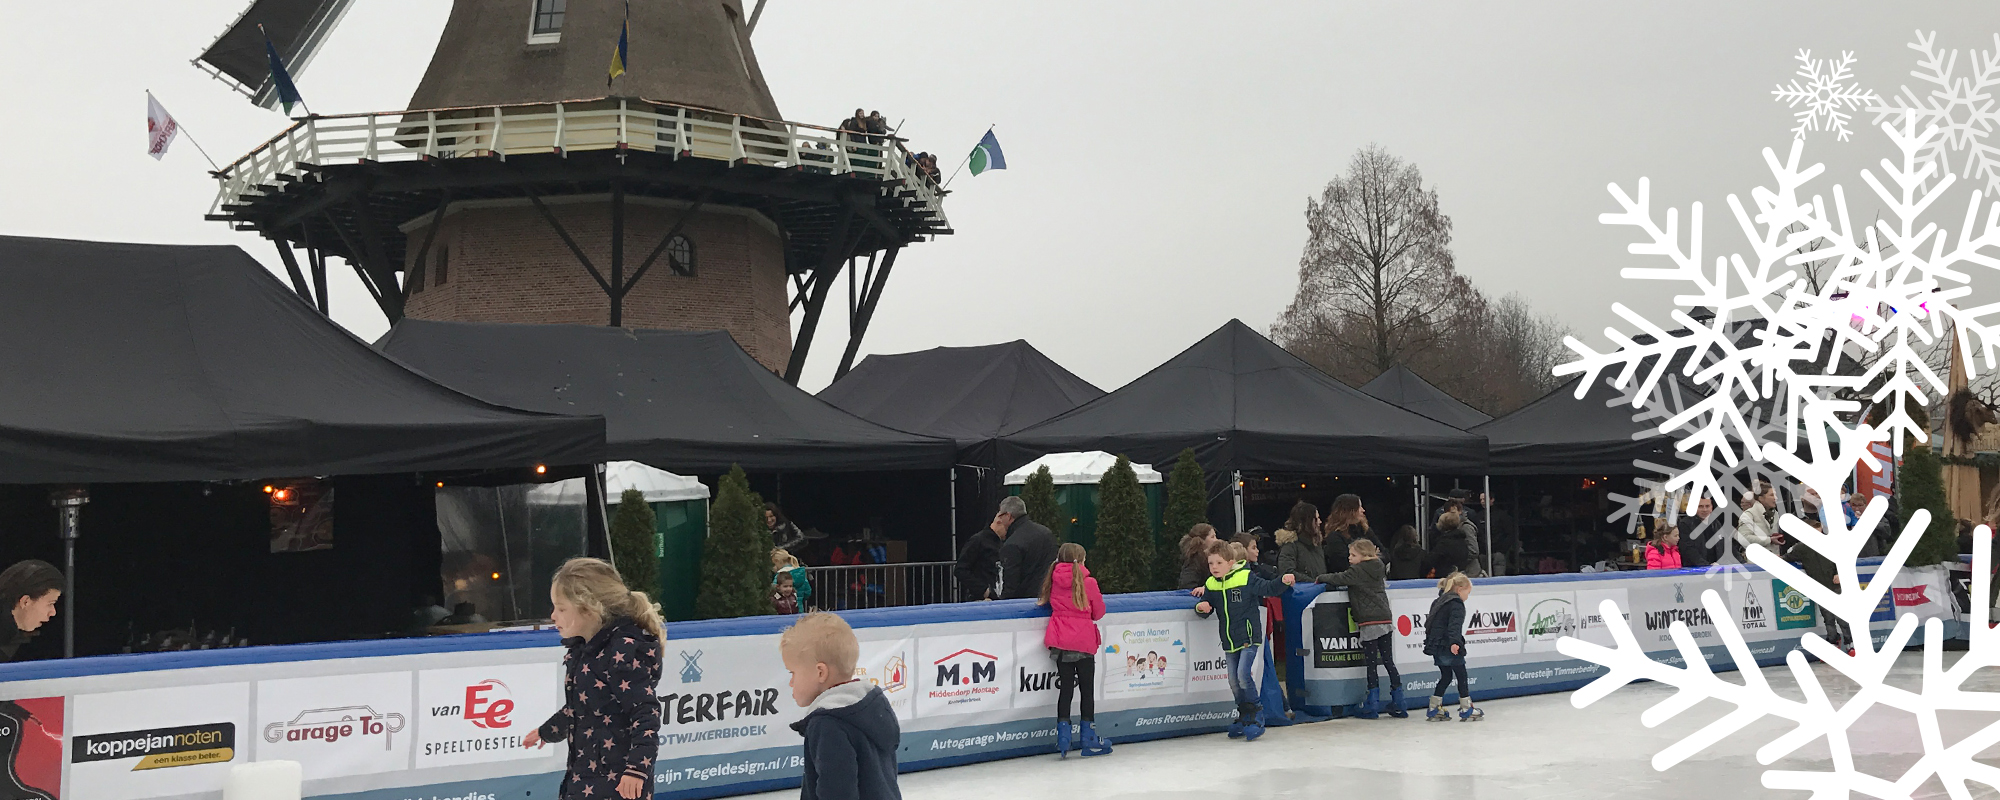 Winterfair_vrijwilligers_1